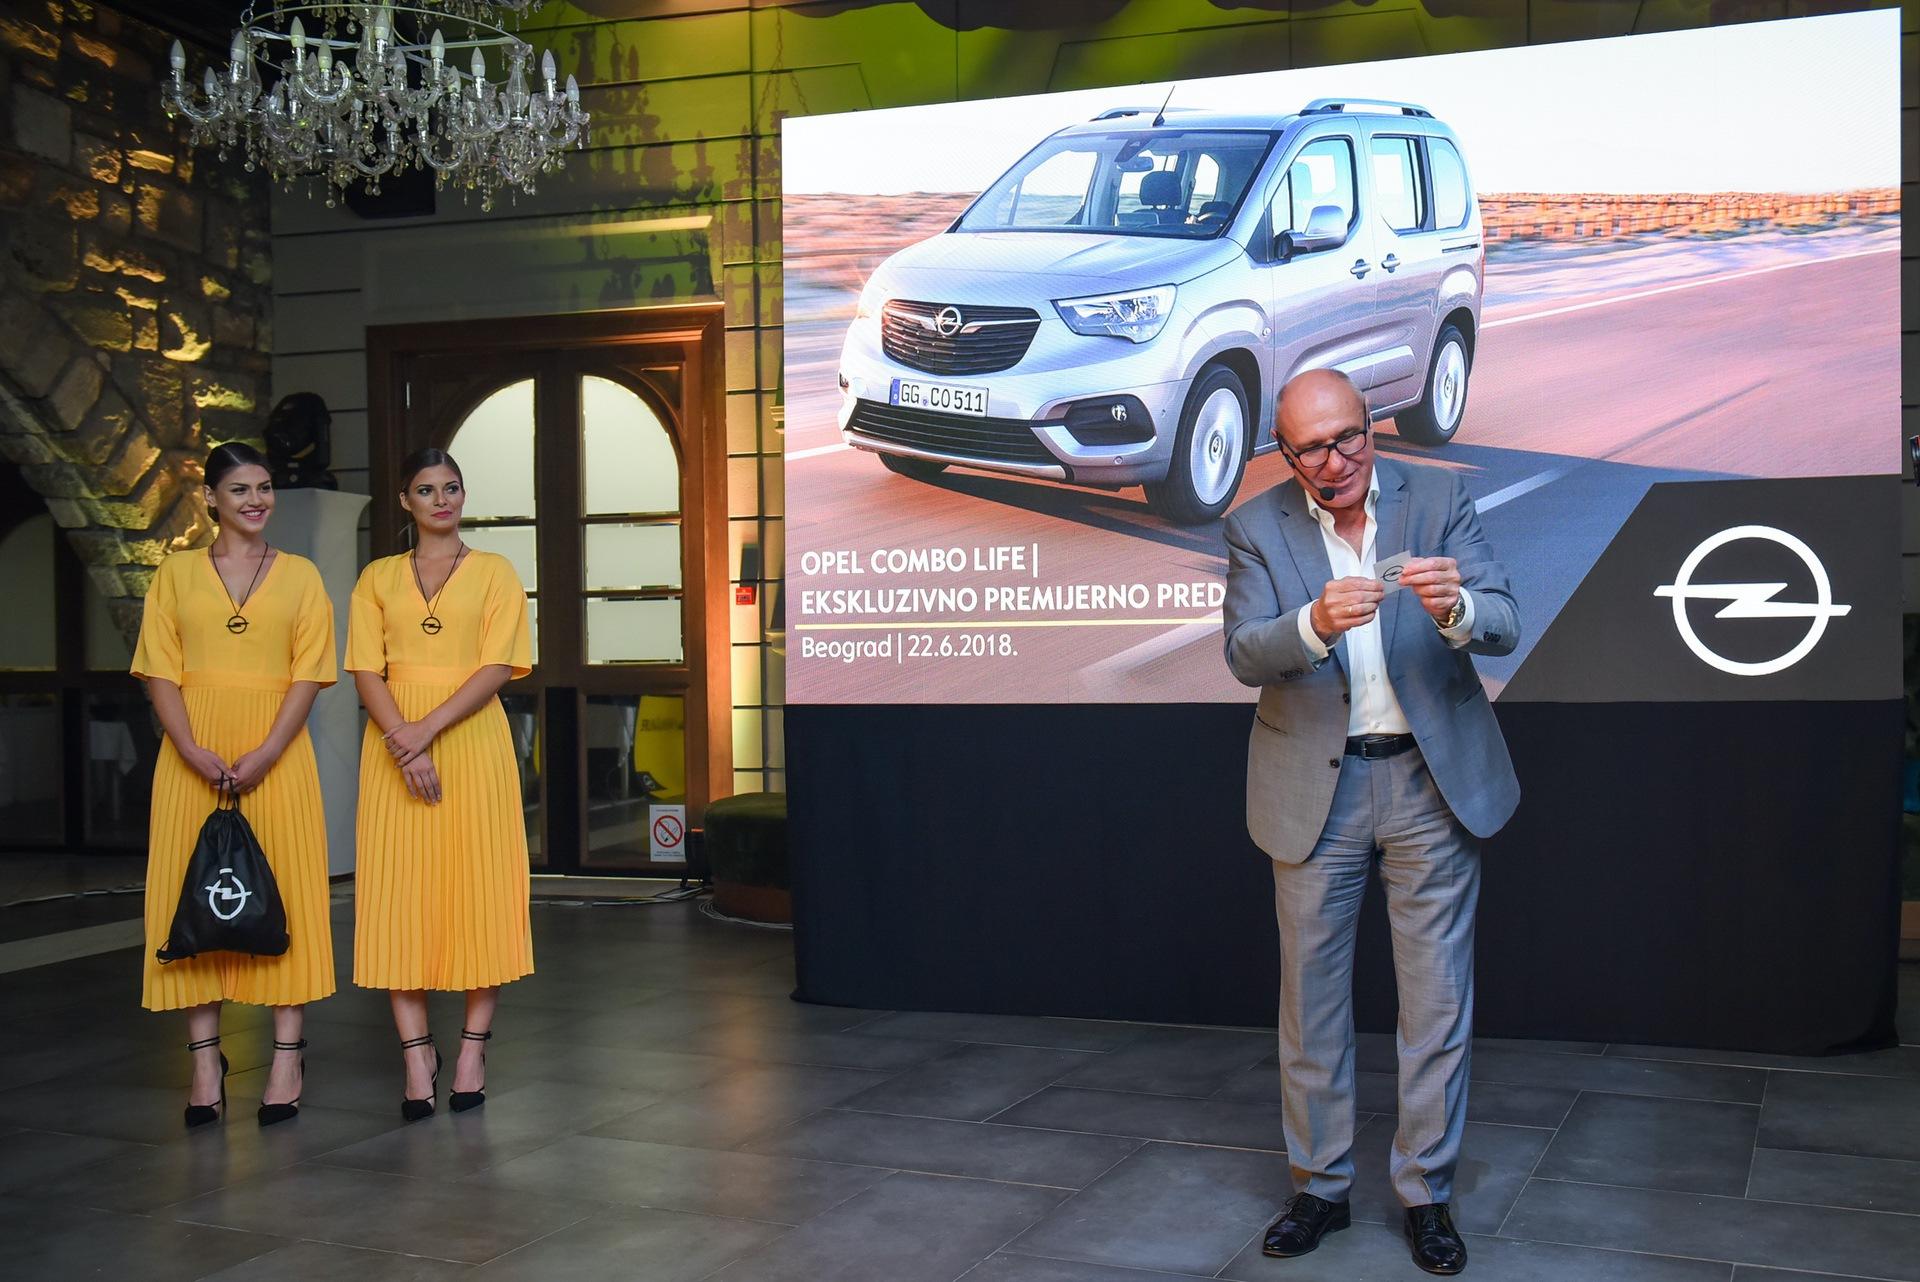 Opel_Combo_Life_static_0027